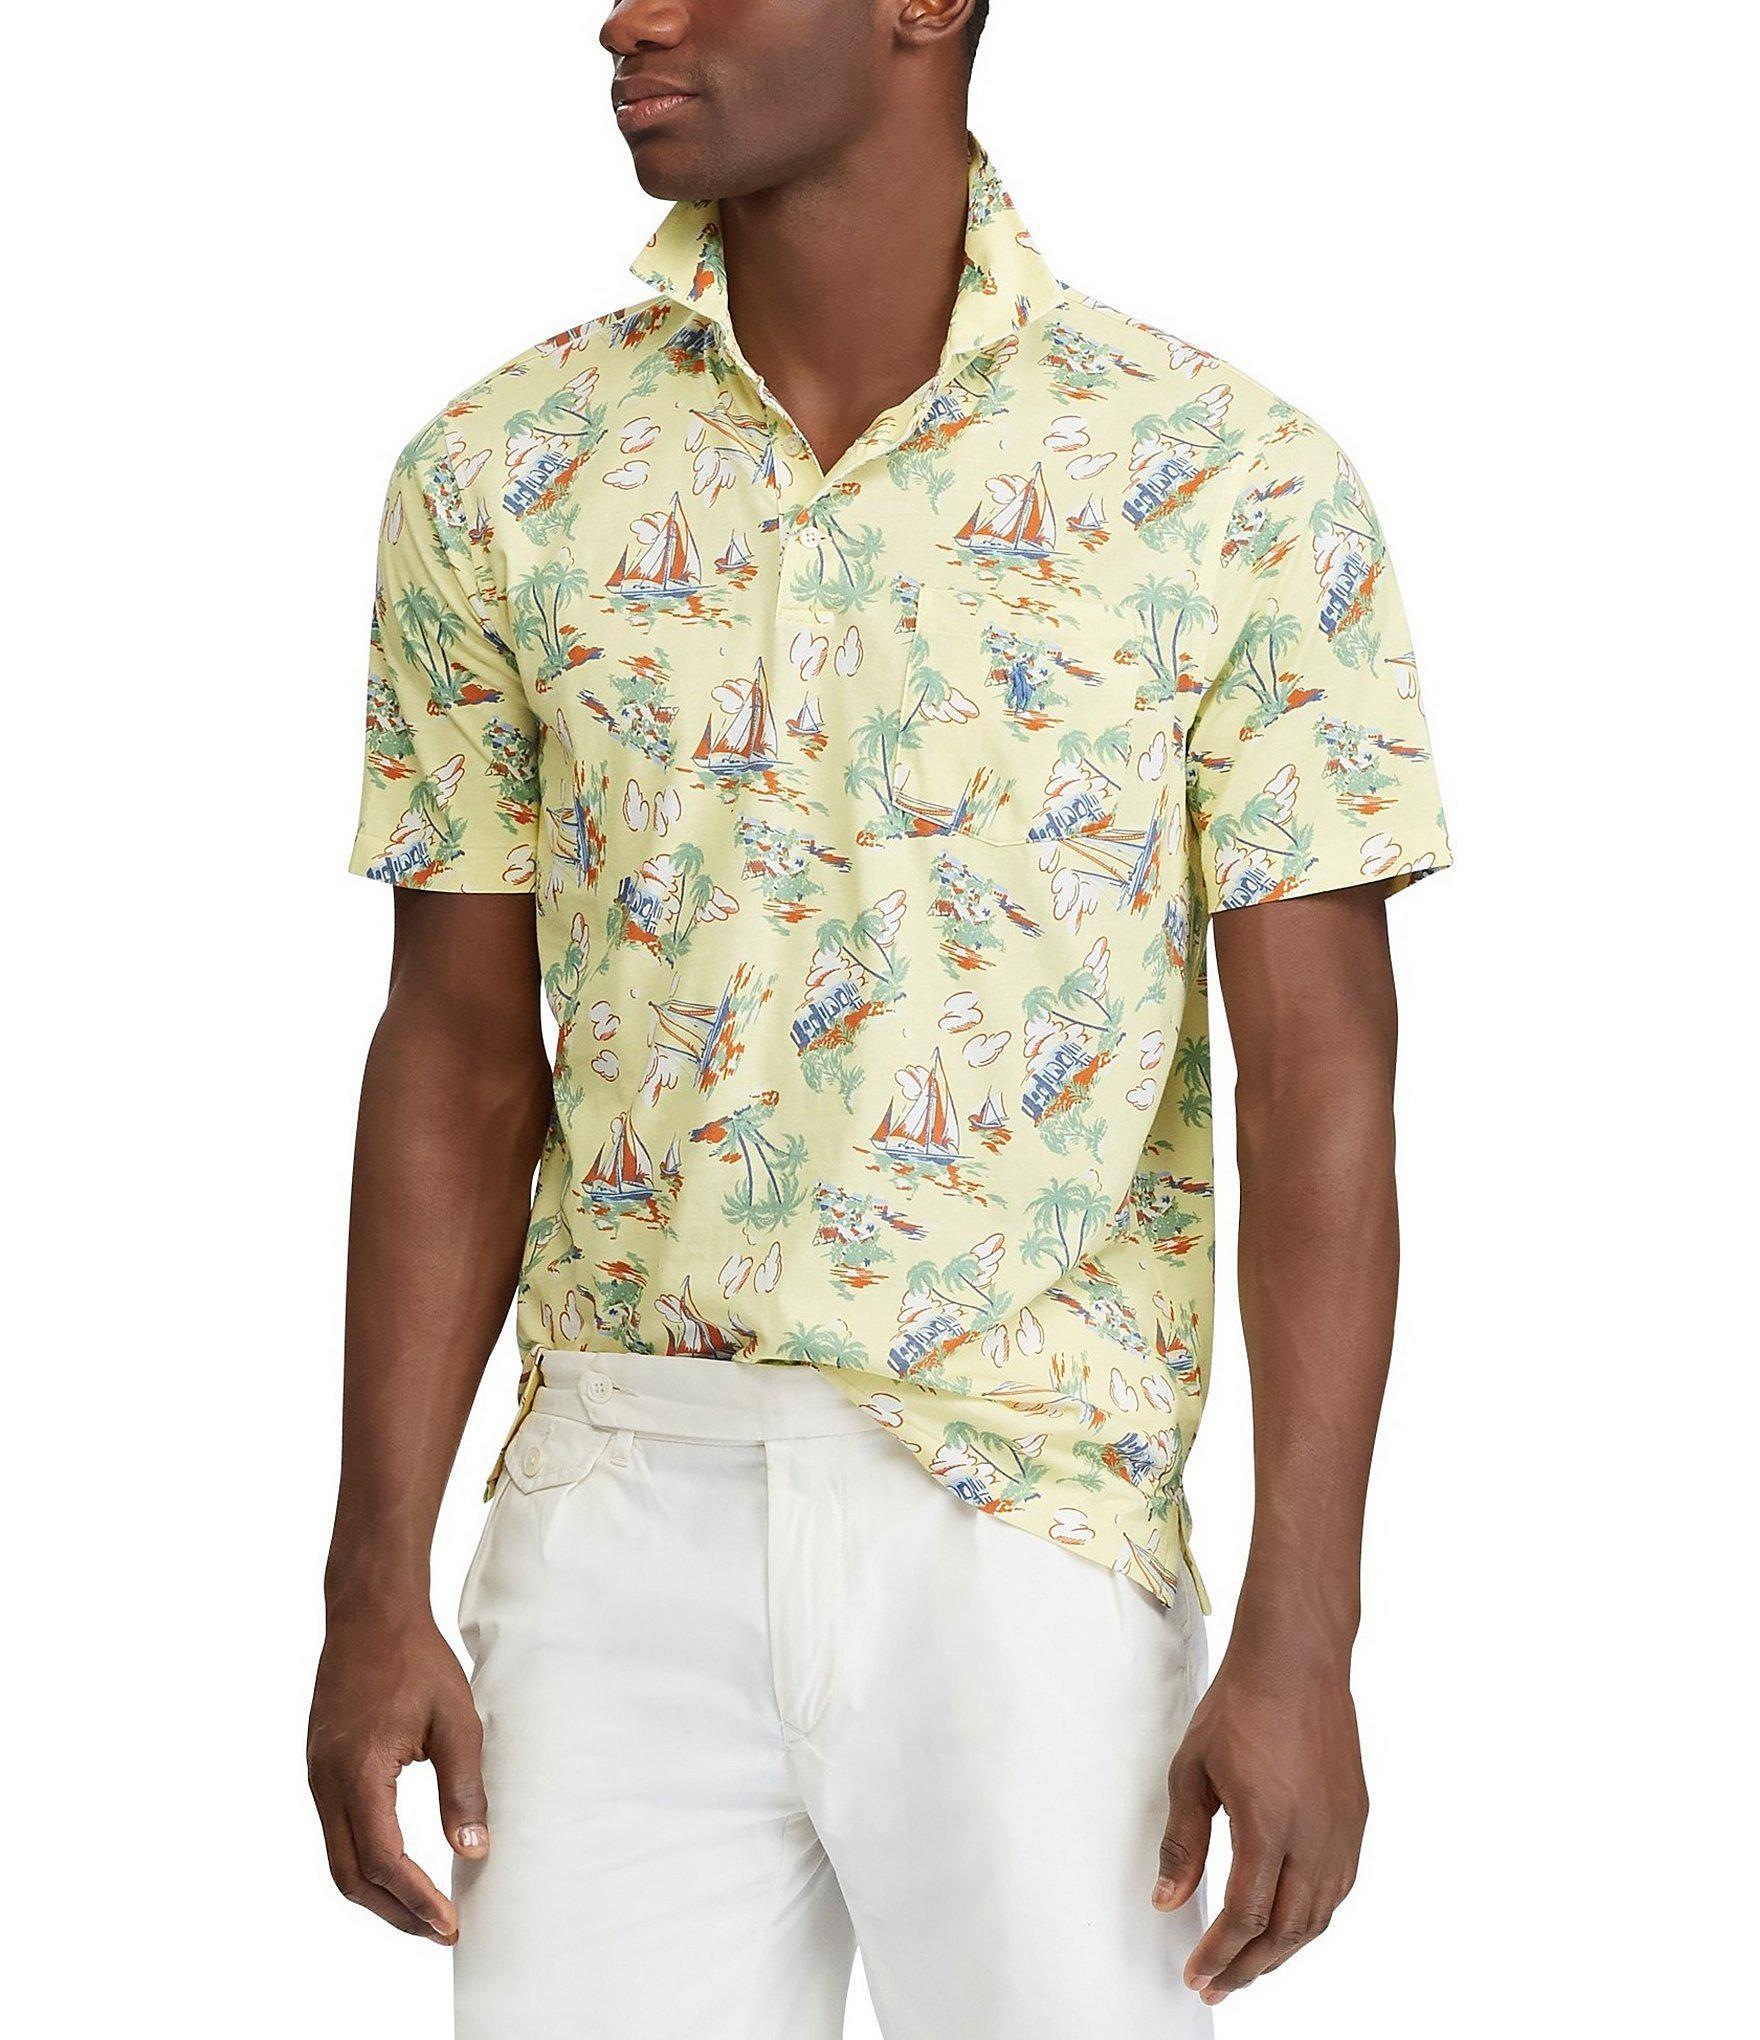 56fdb53e Polo Button Down Shirts Dillards - DREAMWORKS